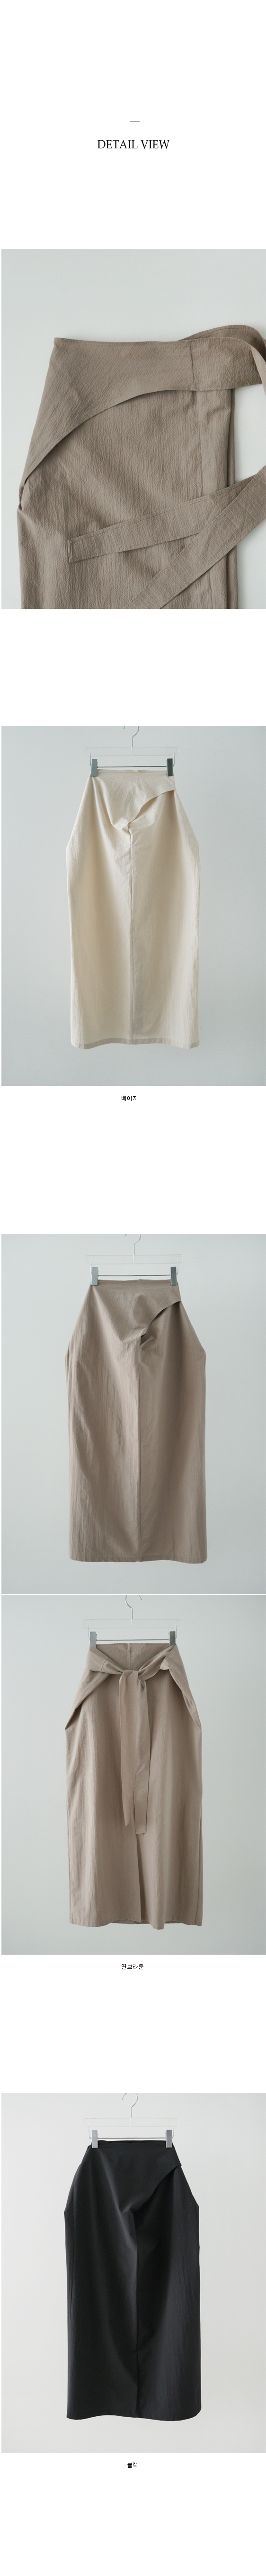 crease texture twist skirt